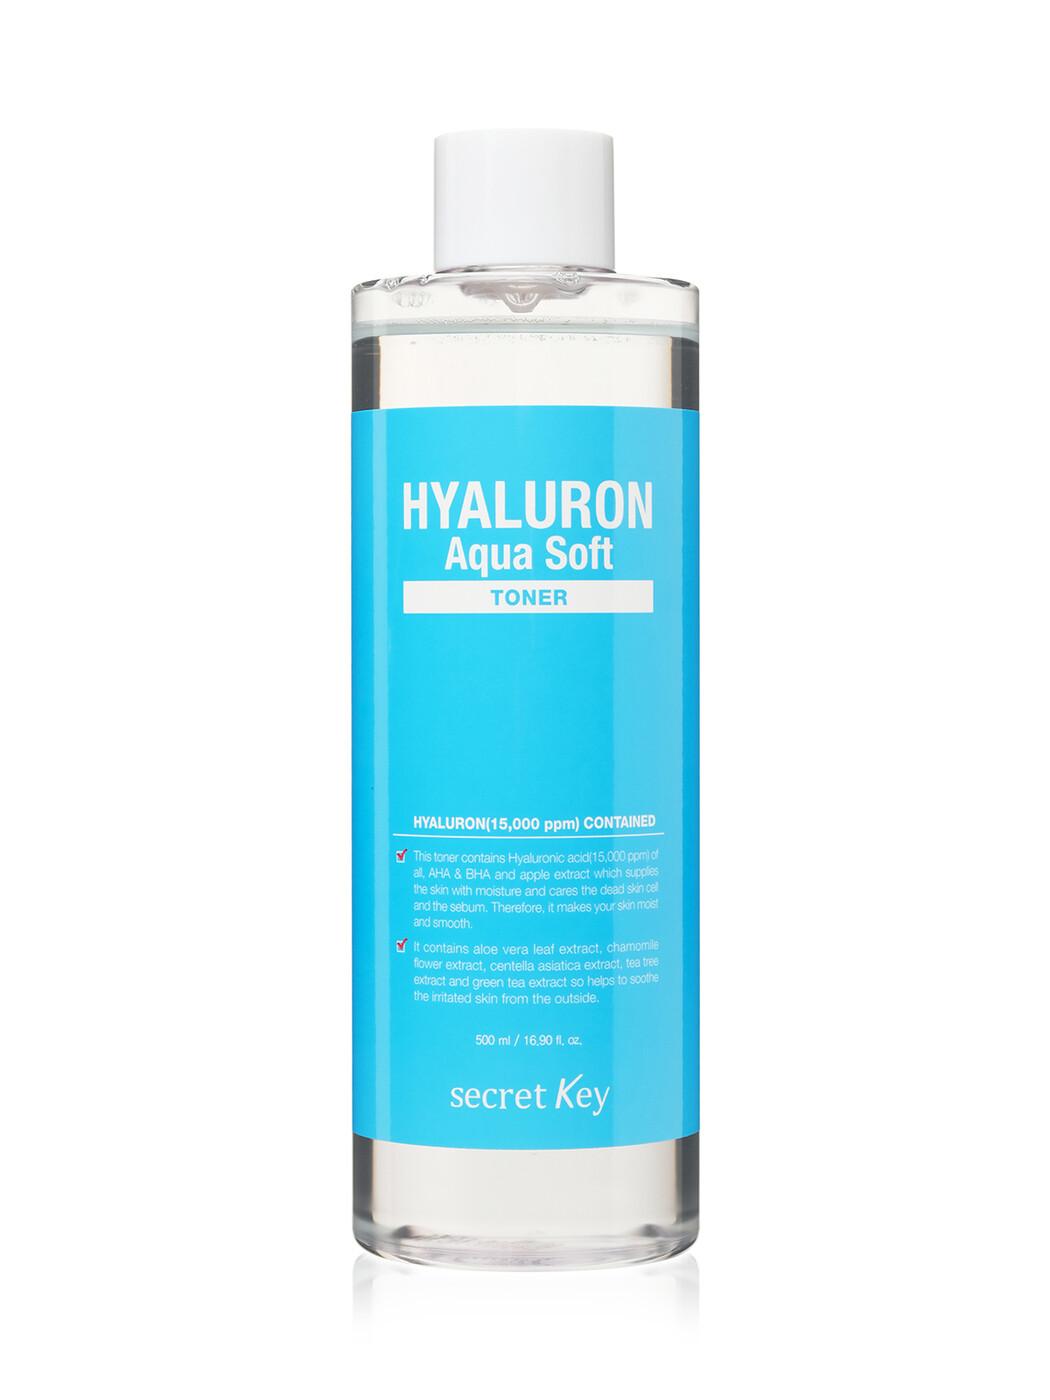 Secret Key Гиалуроновый тонер Hyaluron Aqua Soft Toner